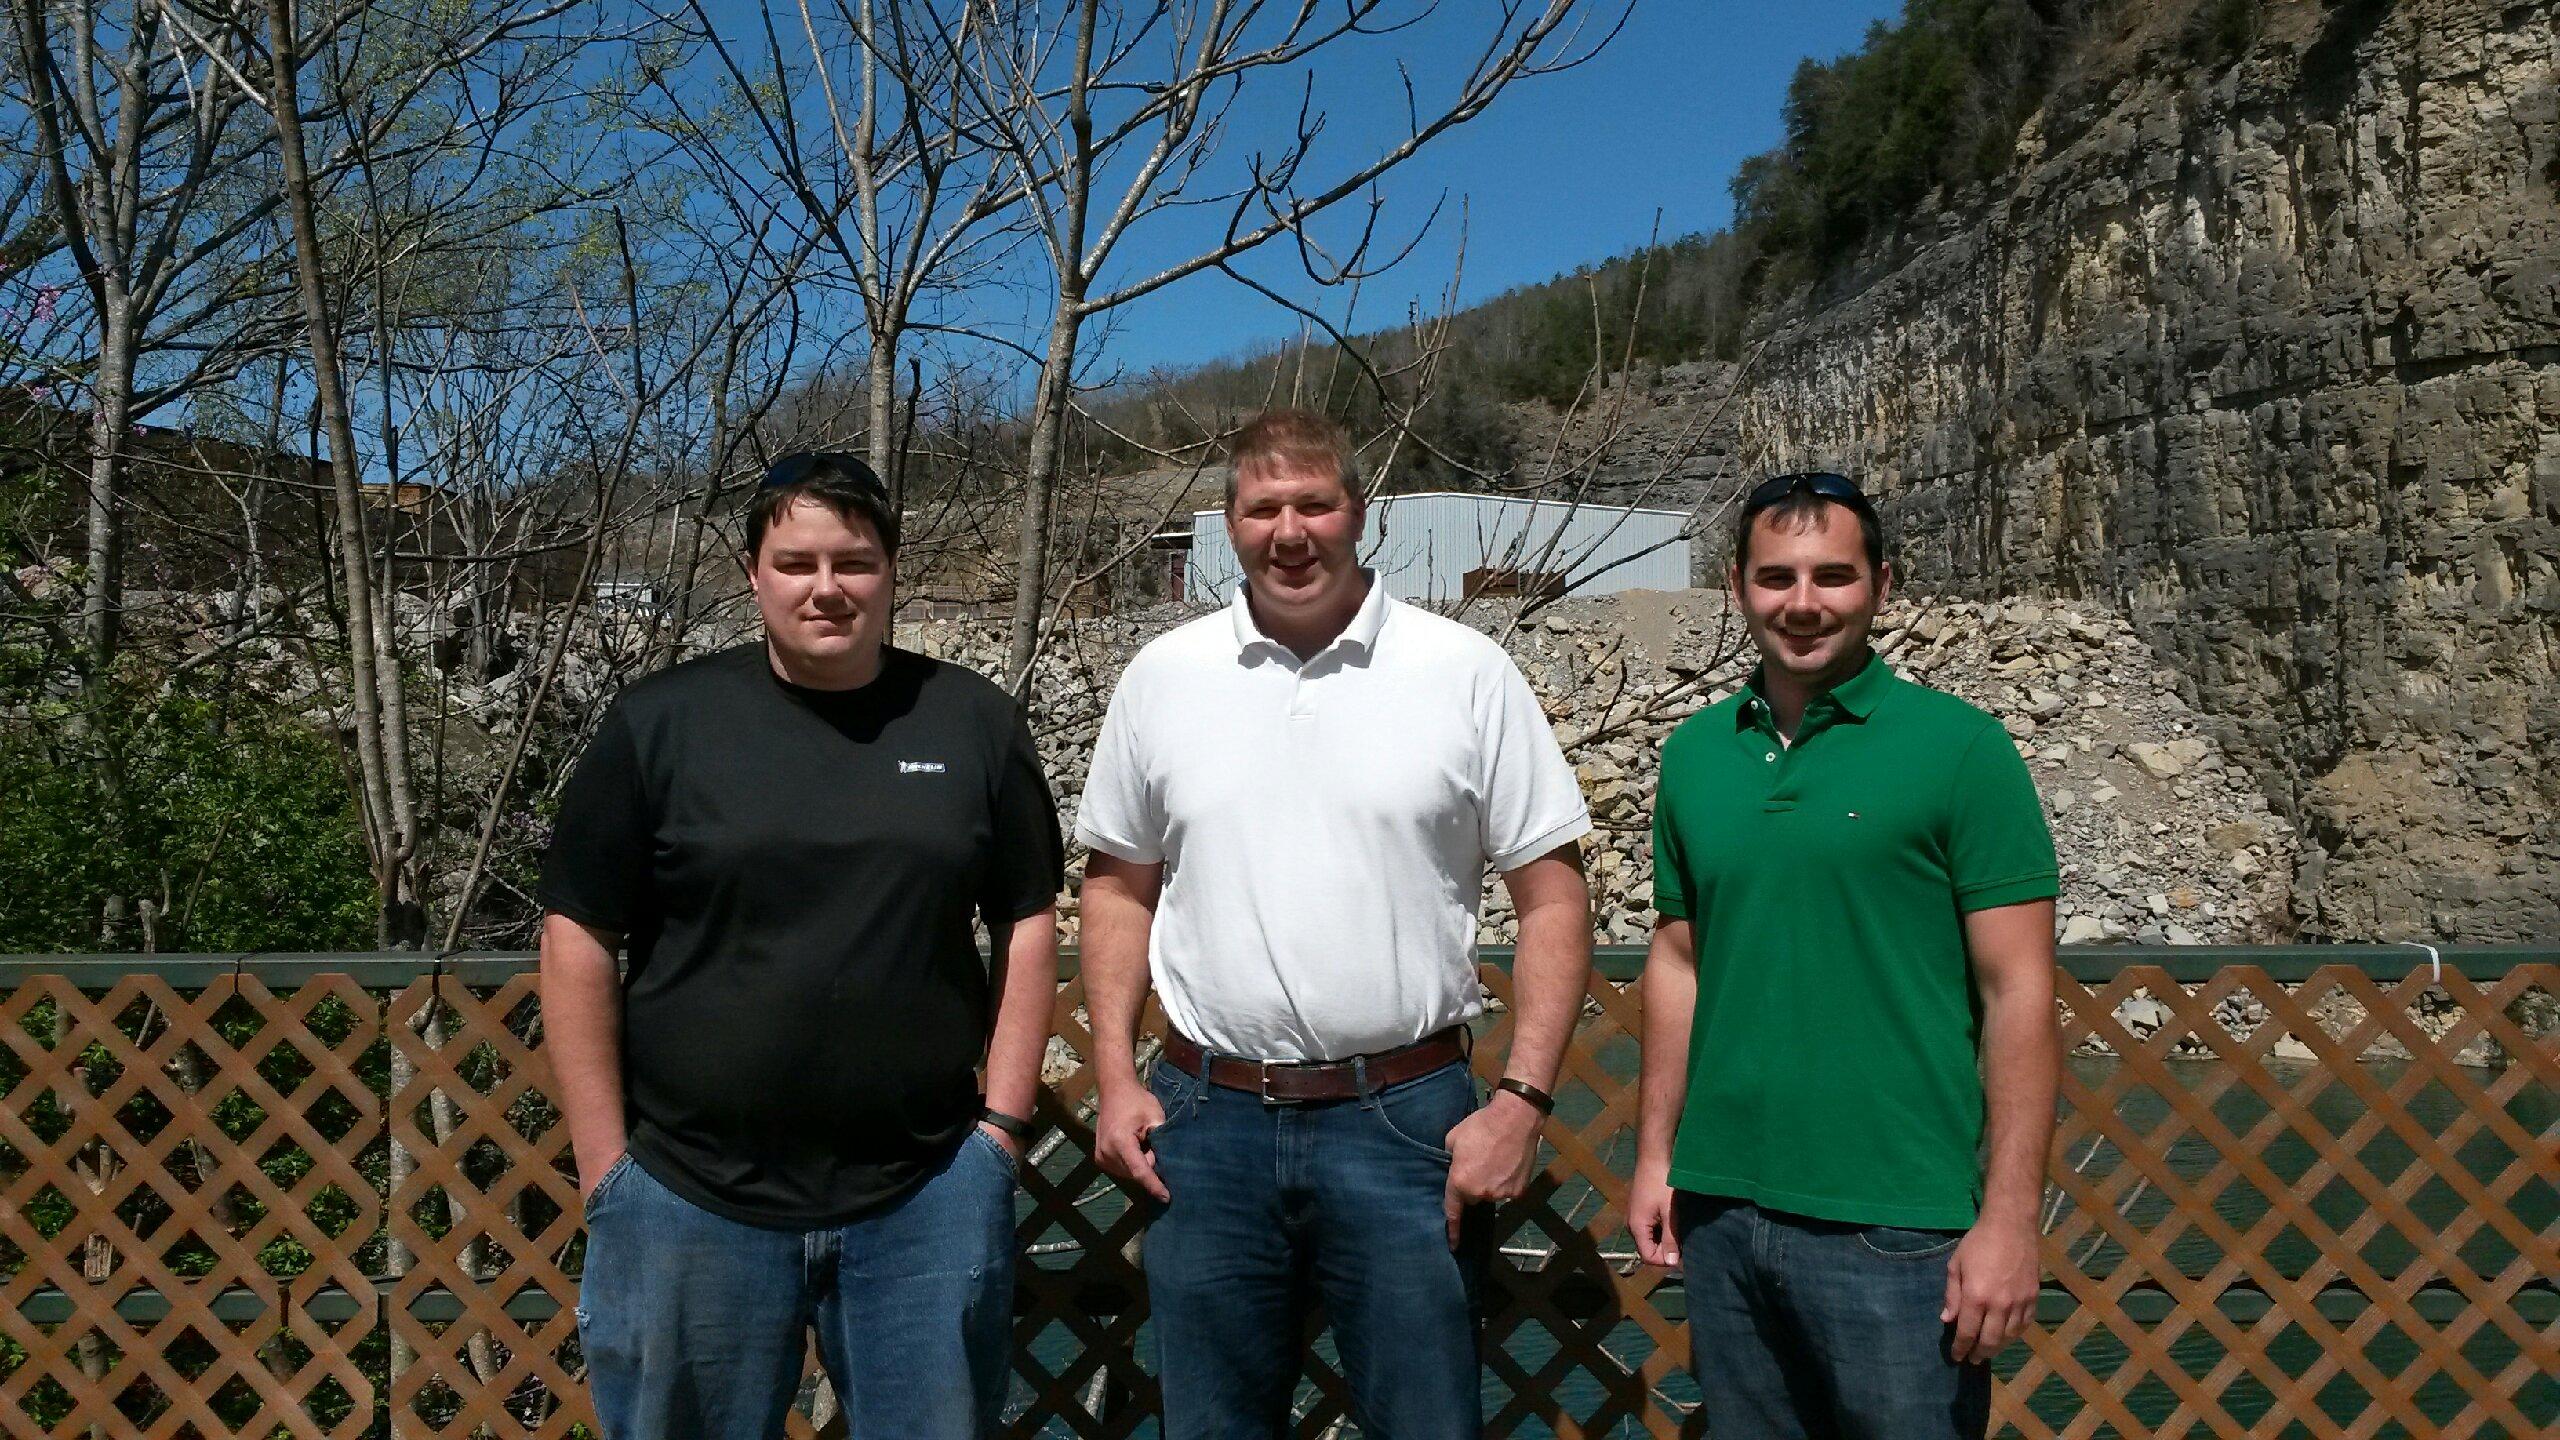 Drew, Jarrod, and Kyle